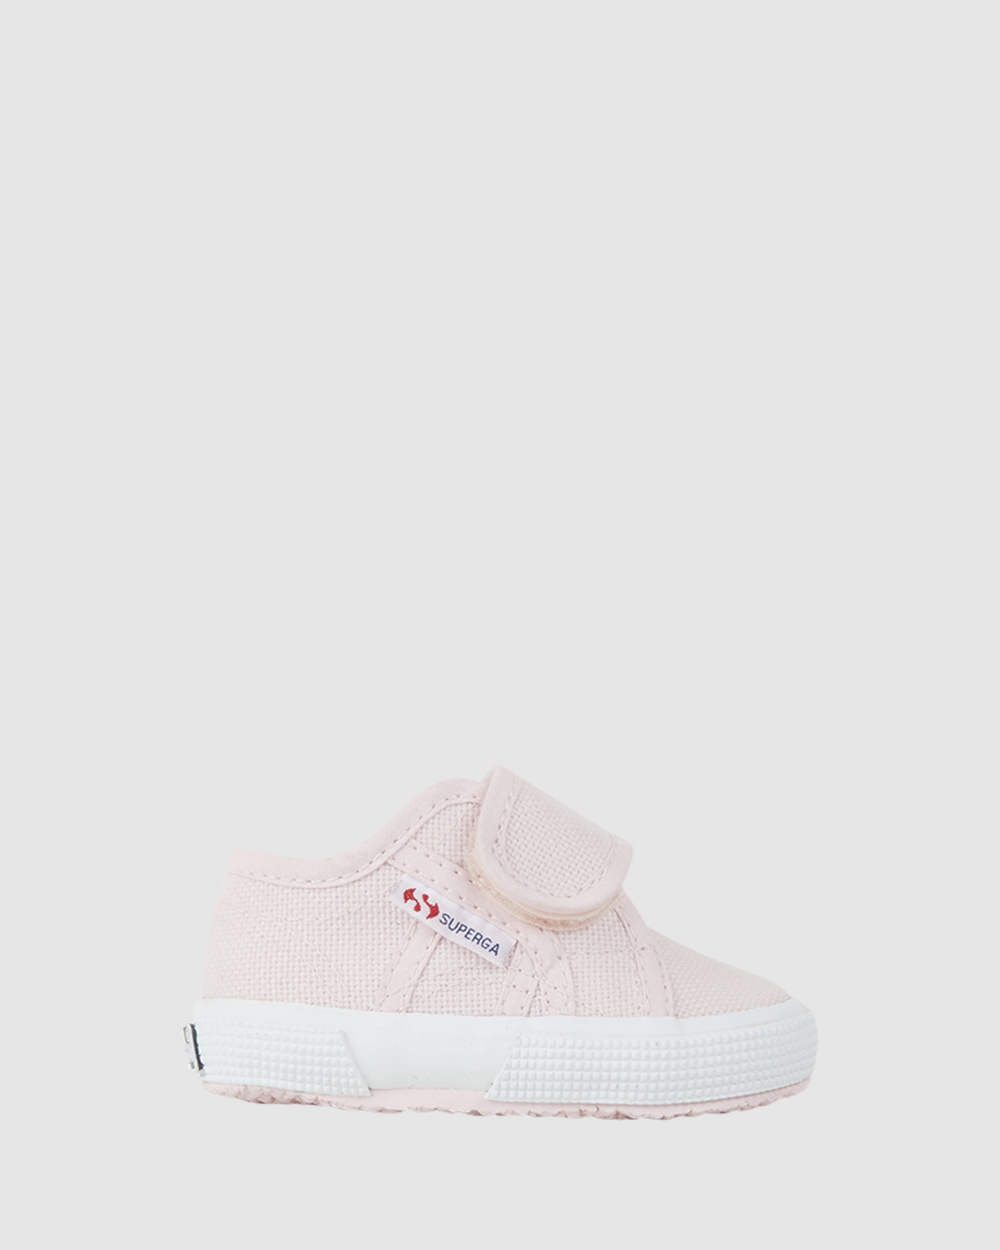 Superga 2750 Bvel Infant Sneakers Pink Pale Lilac 2750-Bvel Australia